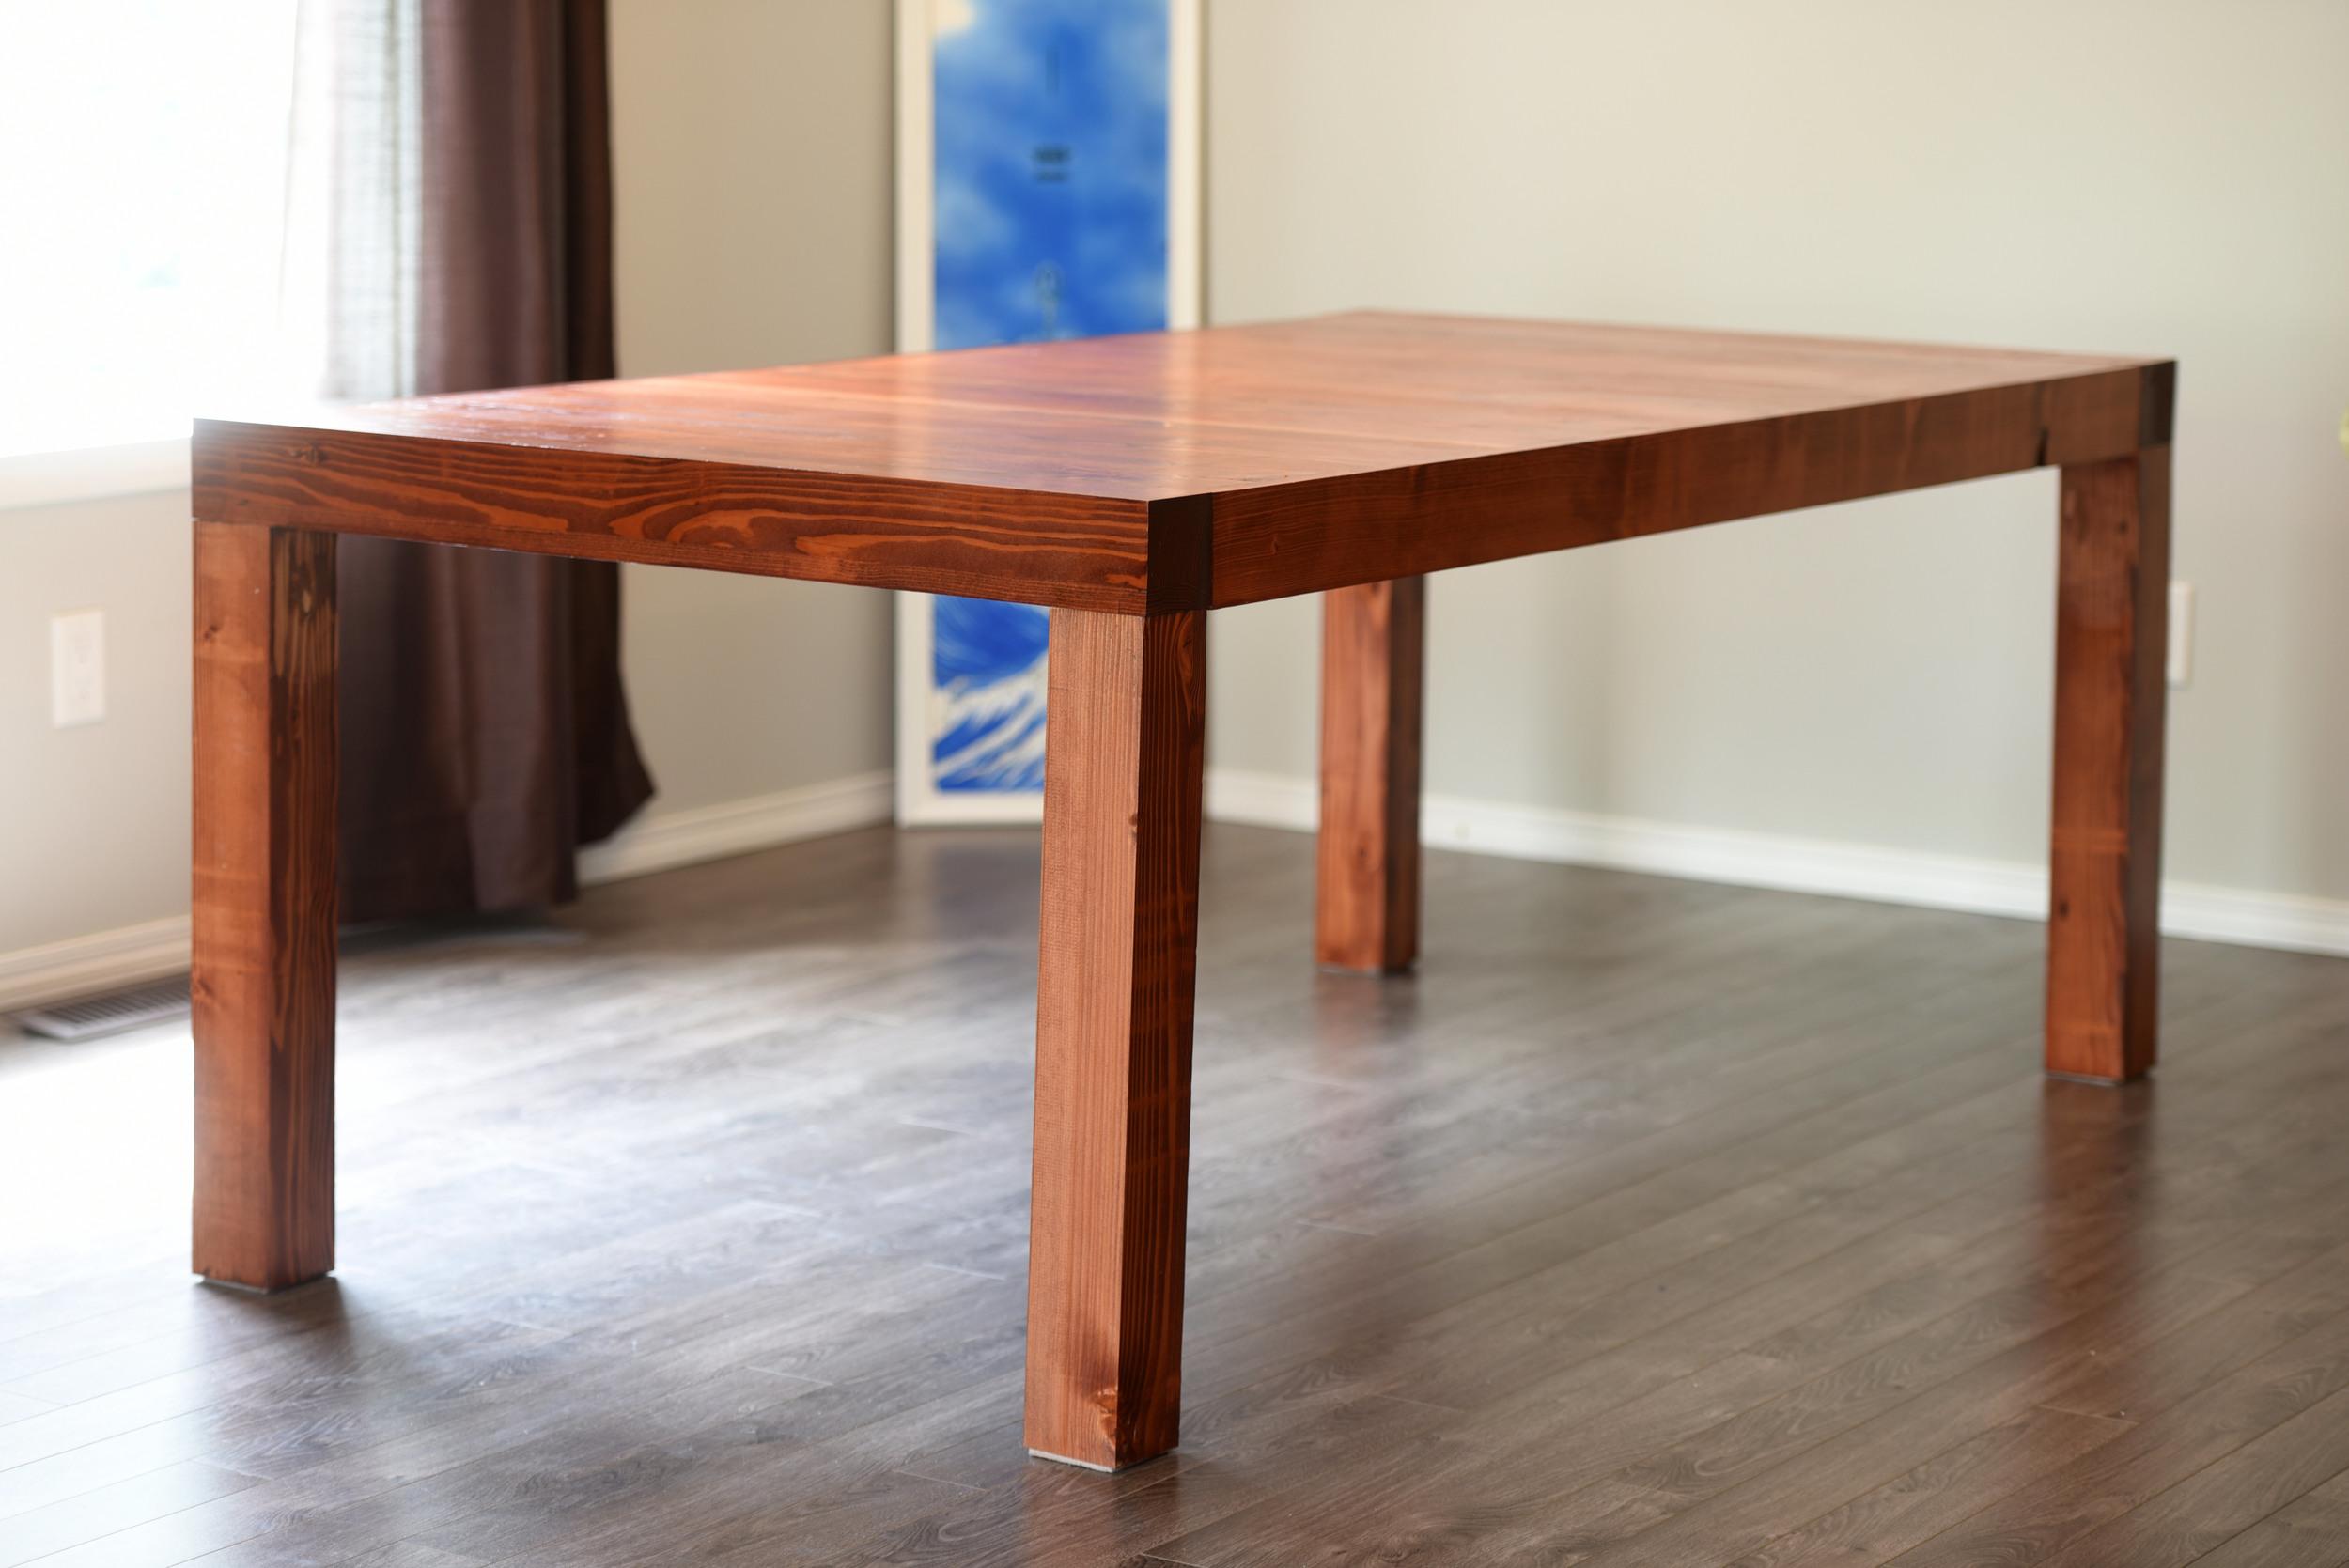 mortise-and-tenon-reclaimed-douglas-fir-dining-table.jpg